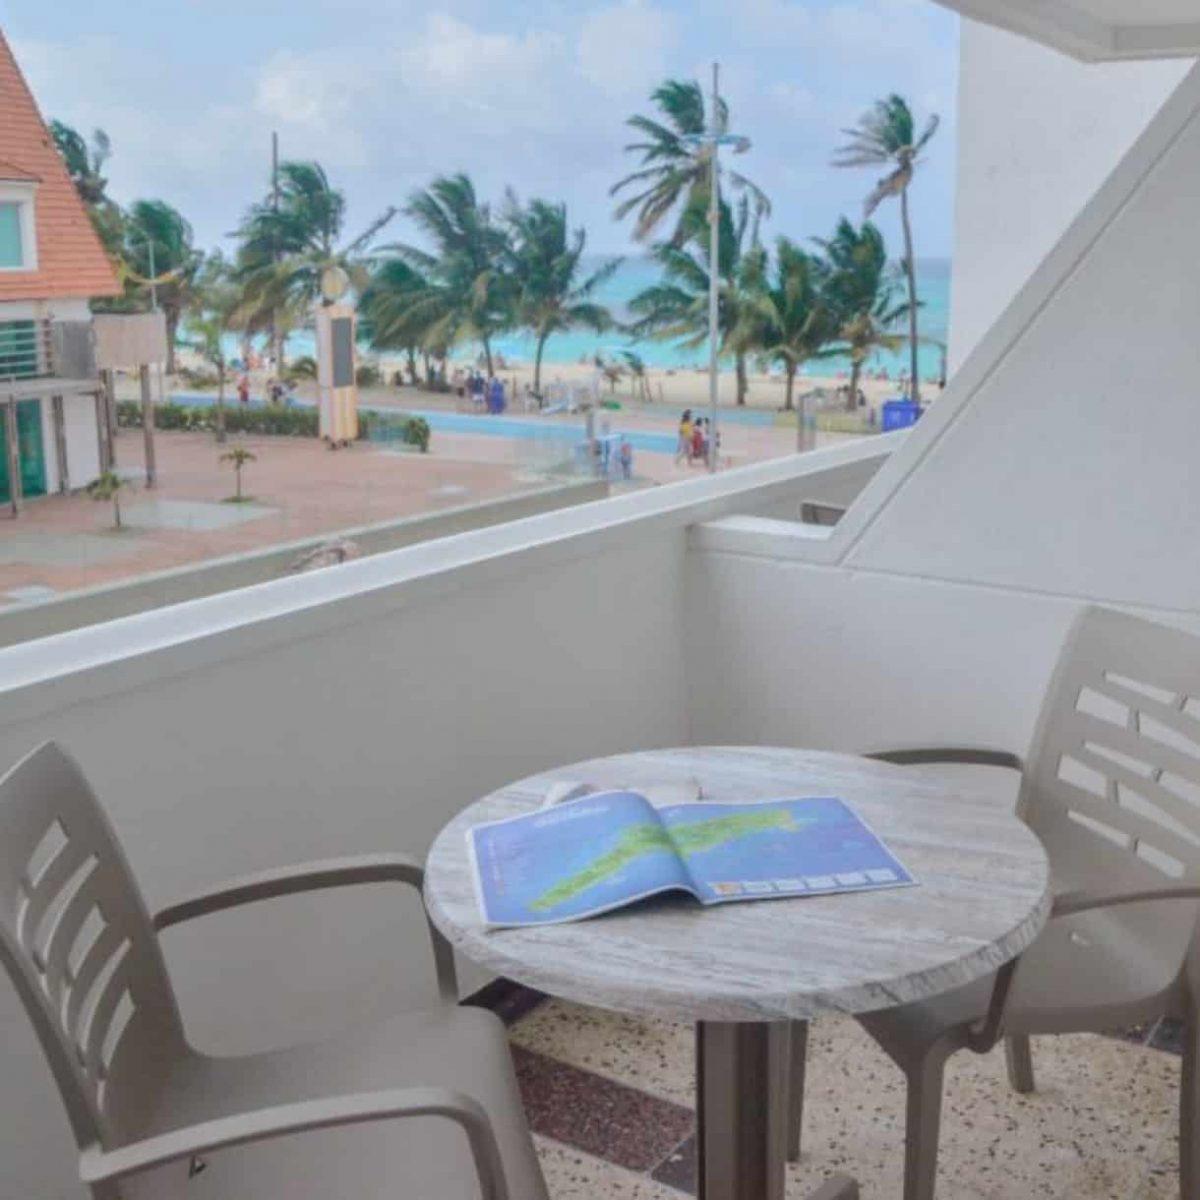 Oferta San Andres: Hotel Portobelo Convention Center Desde $332.930 Cop